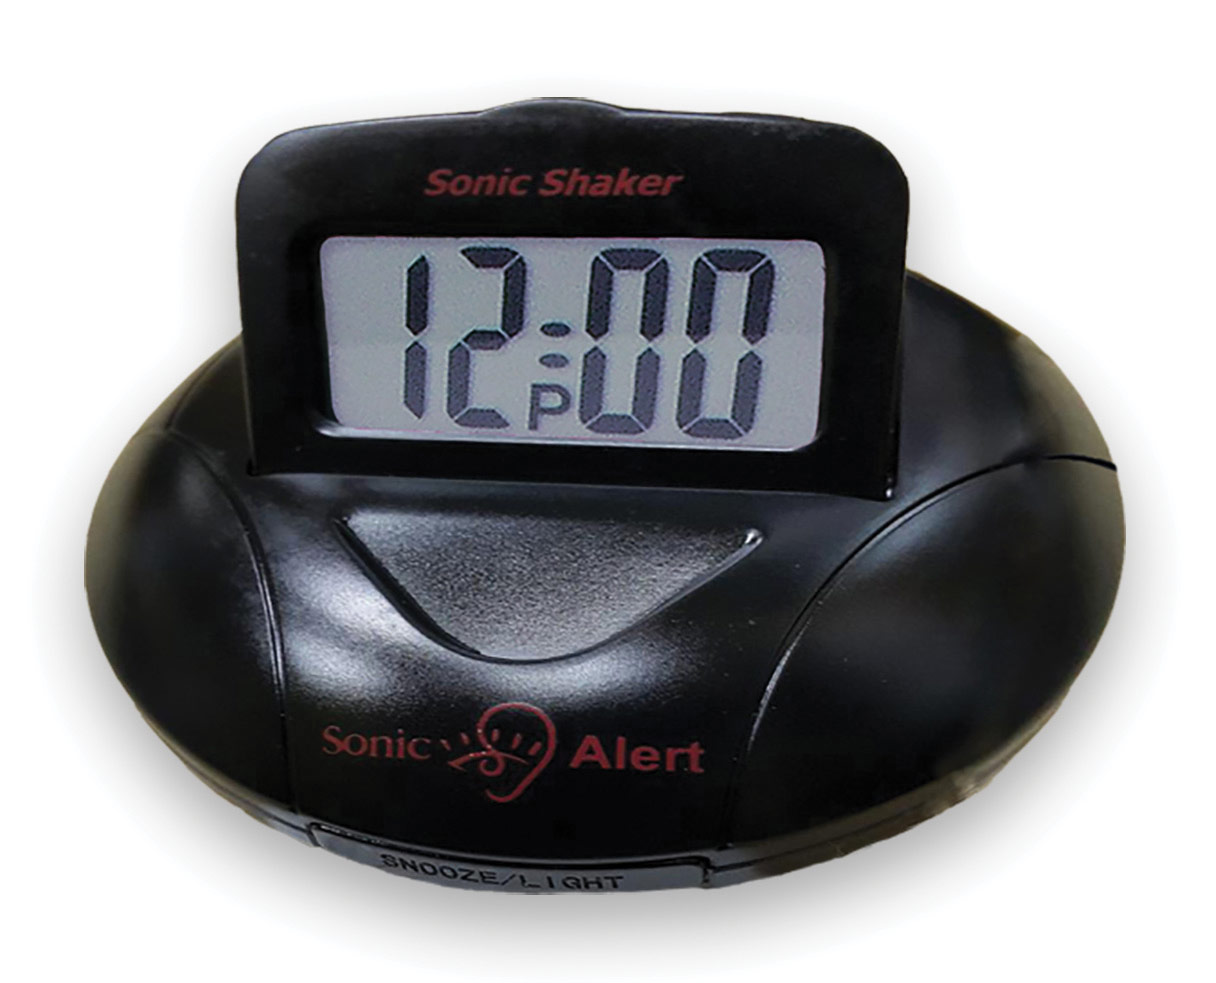 Sonic Alert Sonic Shaker Black Travel Alarm Clock SBP100C